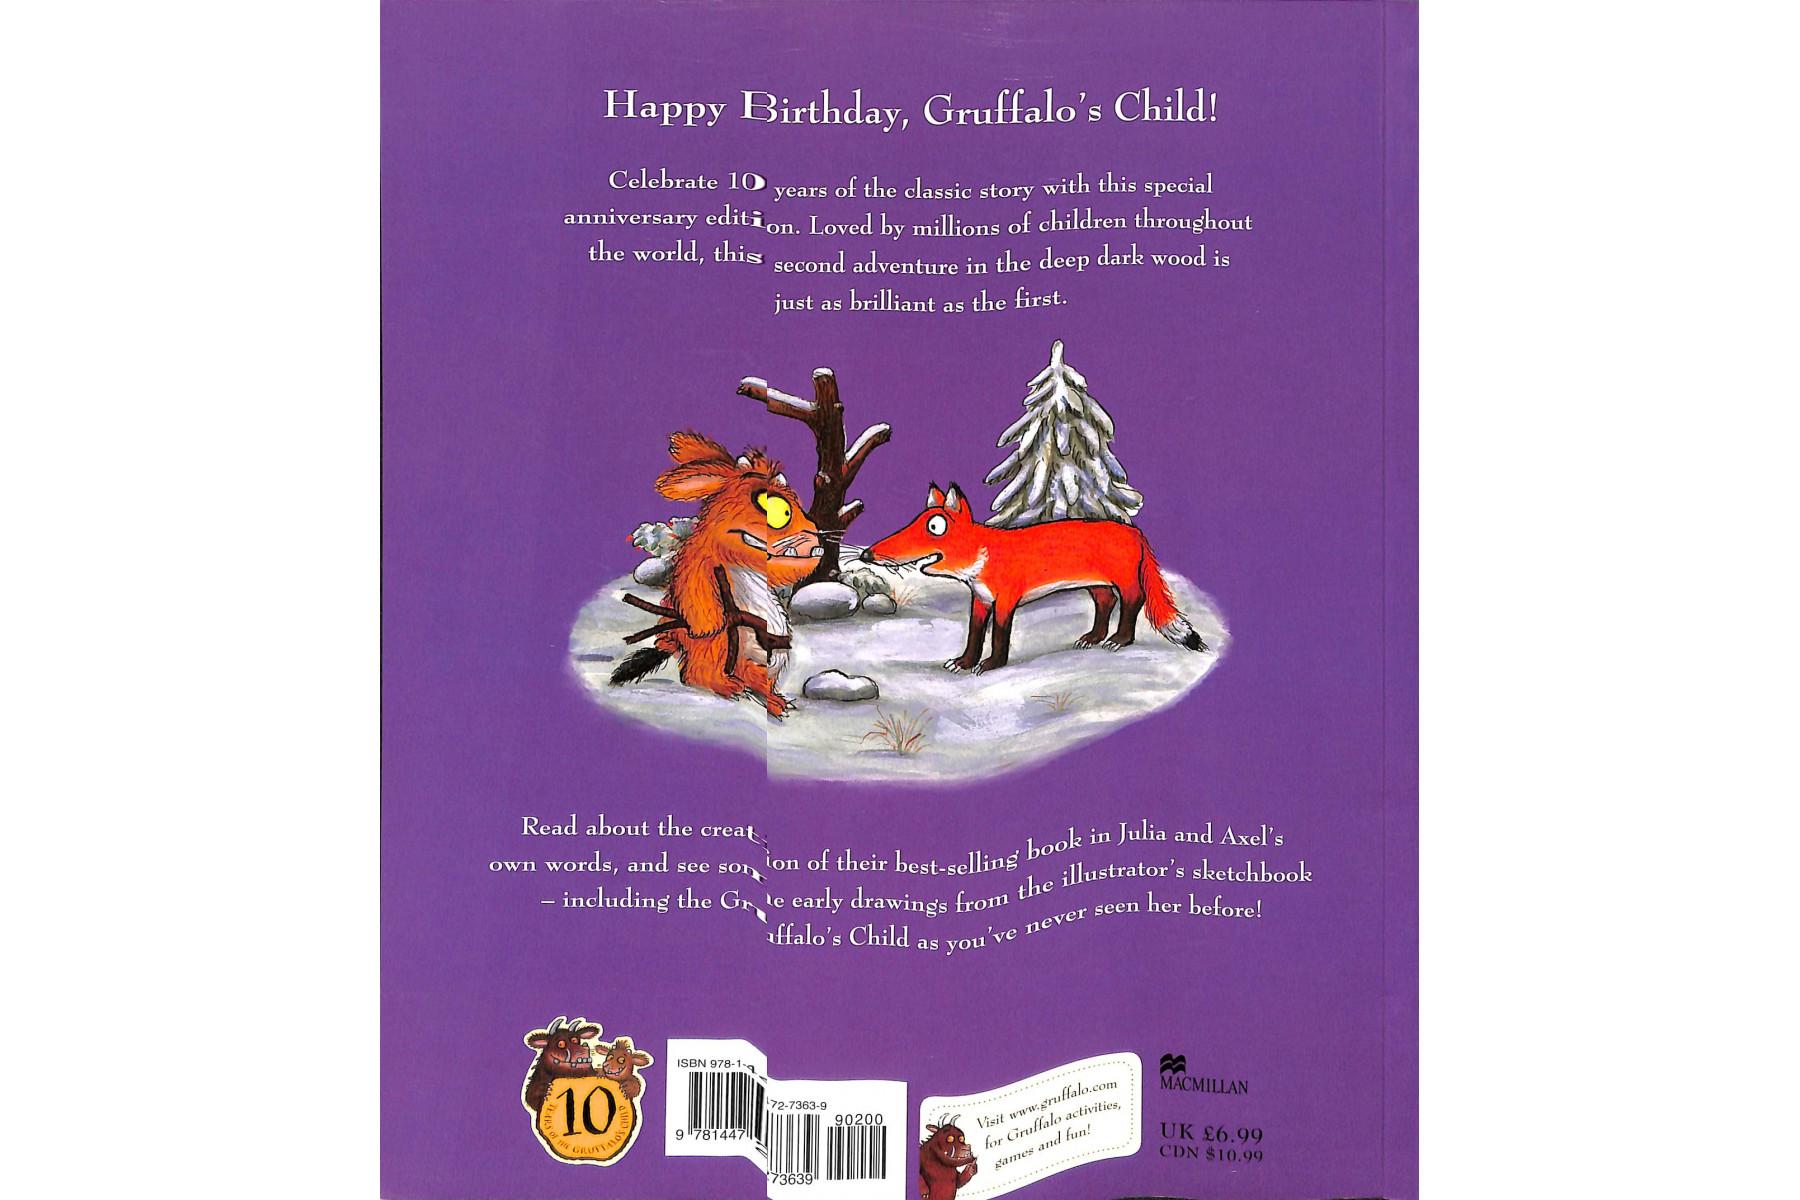 The Gruffalo's Child 10th Anniversary Edition